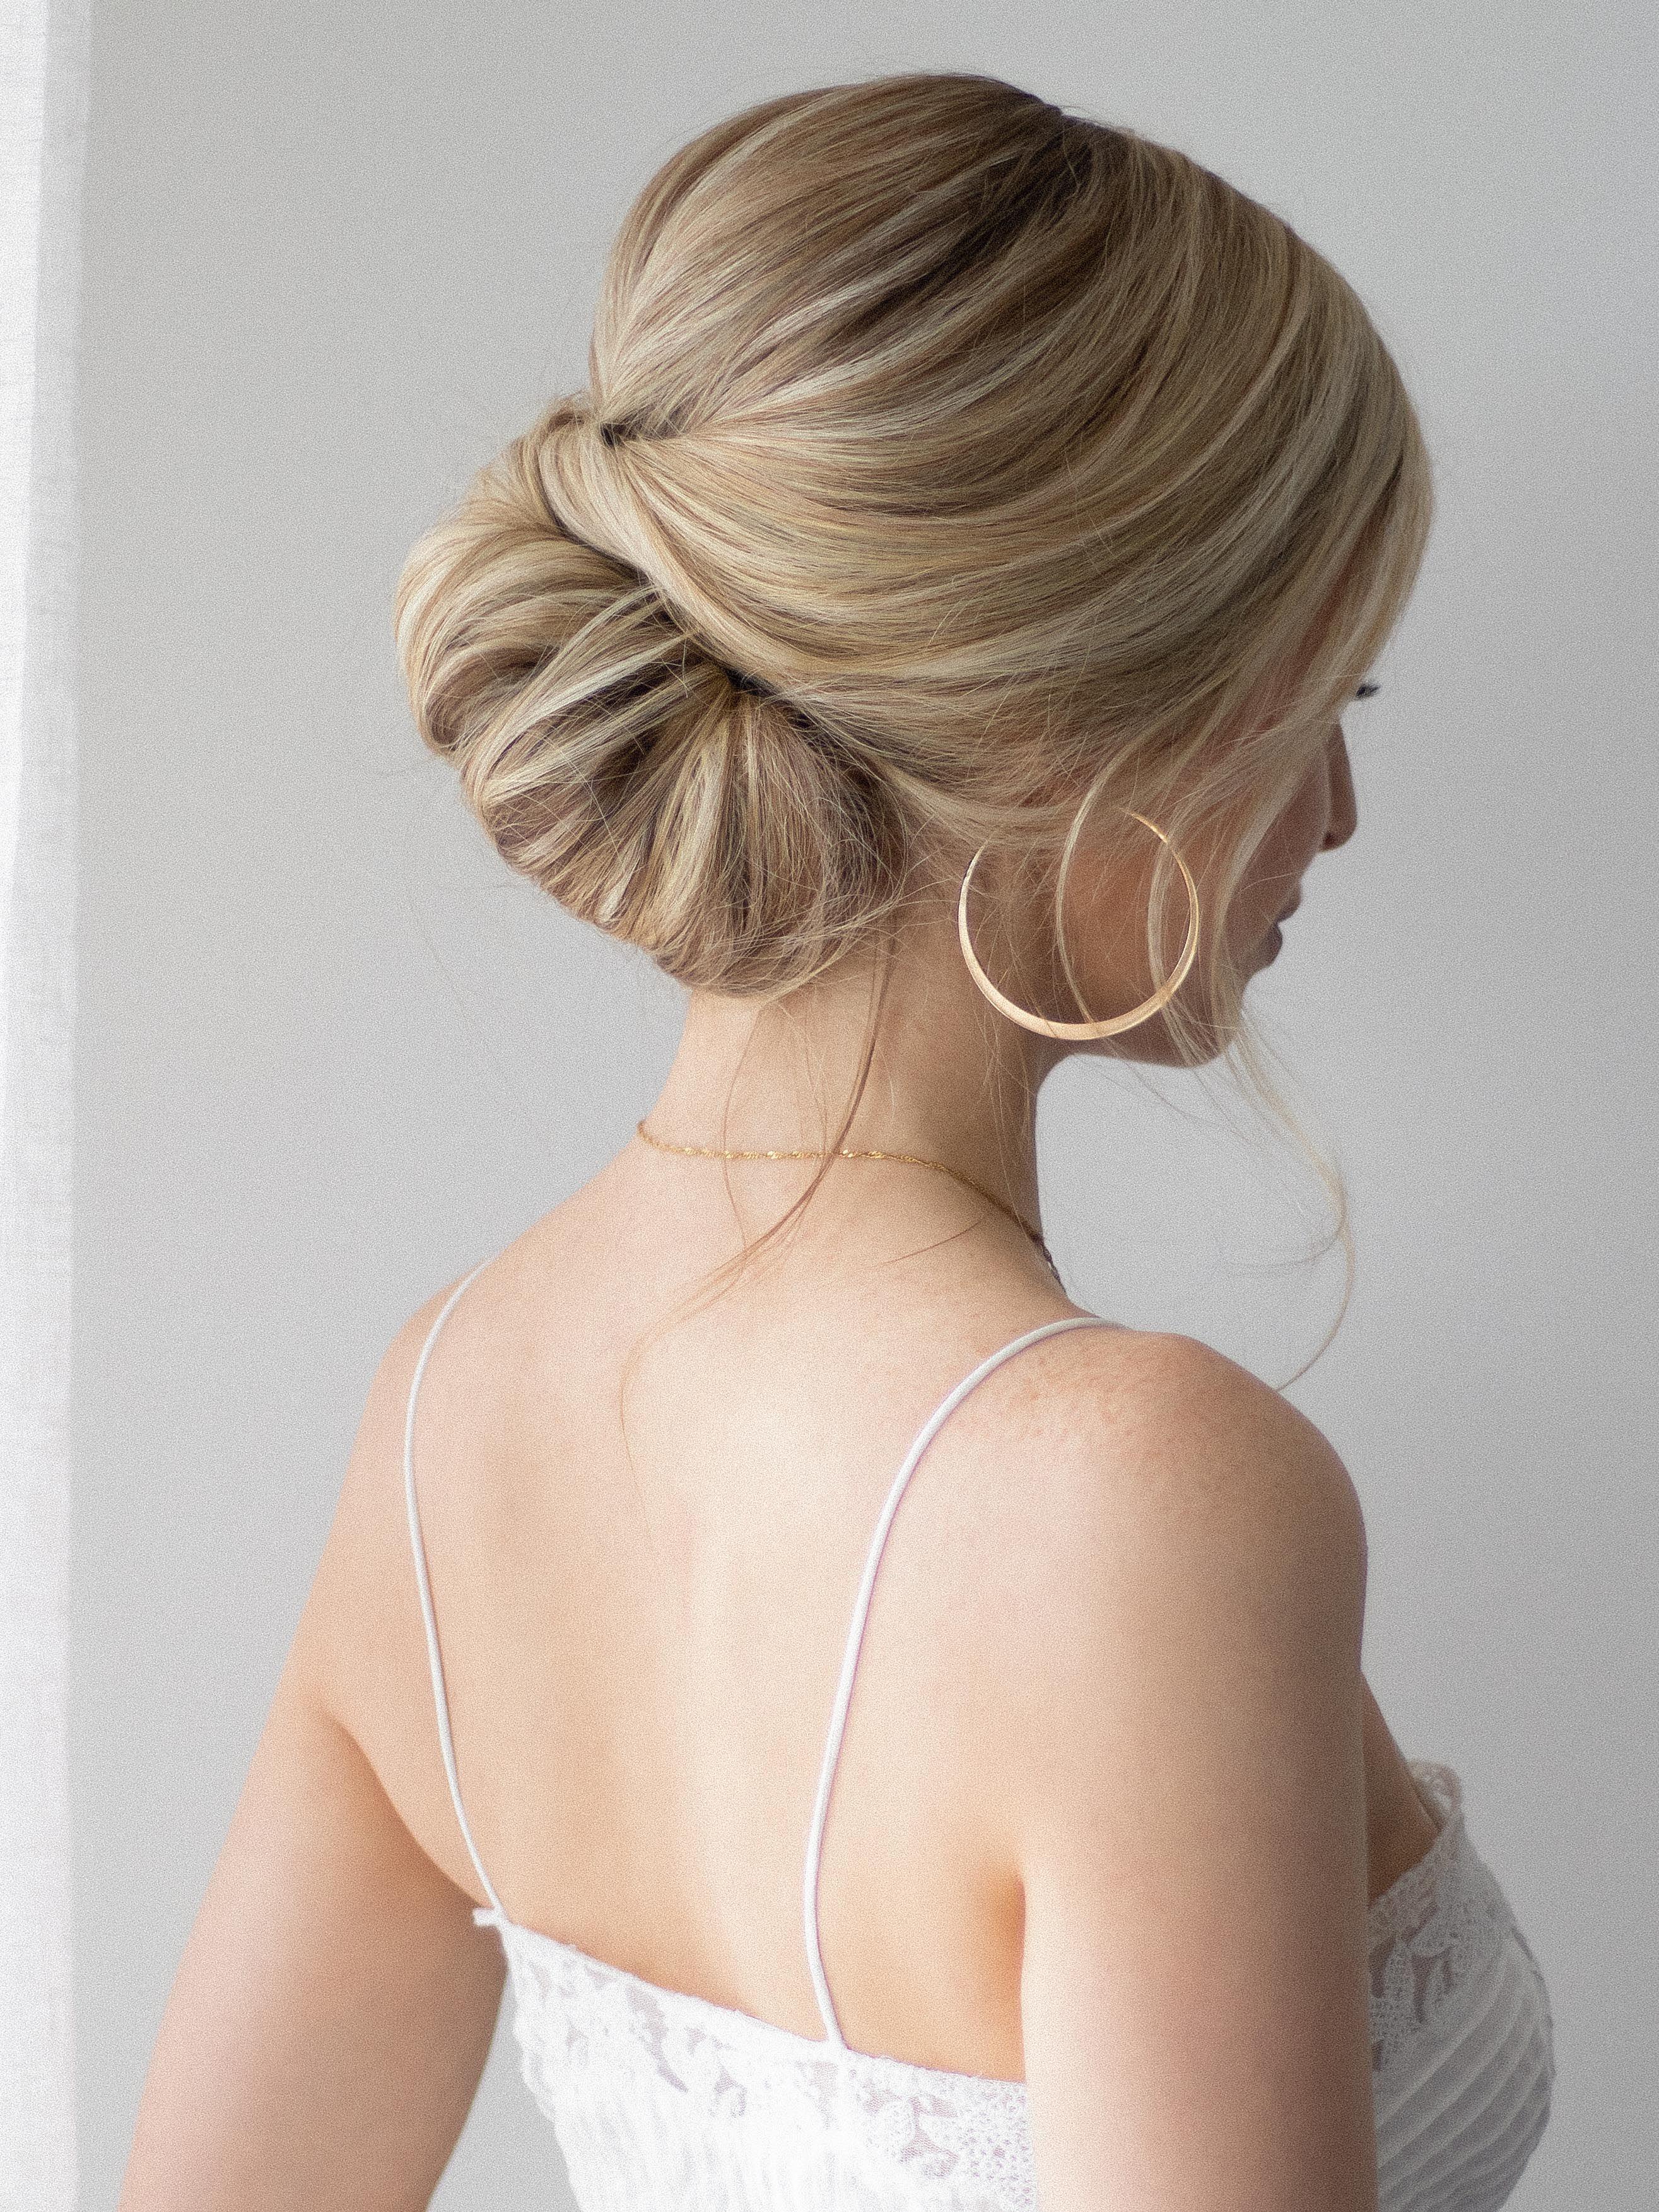 Easy Updo For Short Hair Hair Tutorial Hairupdotutorial Easy Updo For Short Hair The Perfect Wedding H In 2020 Short Hair Tutorial Short Hair Updo Short Hair Styles